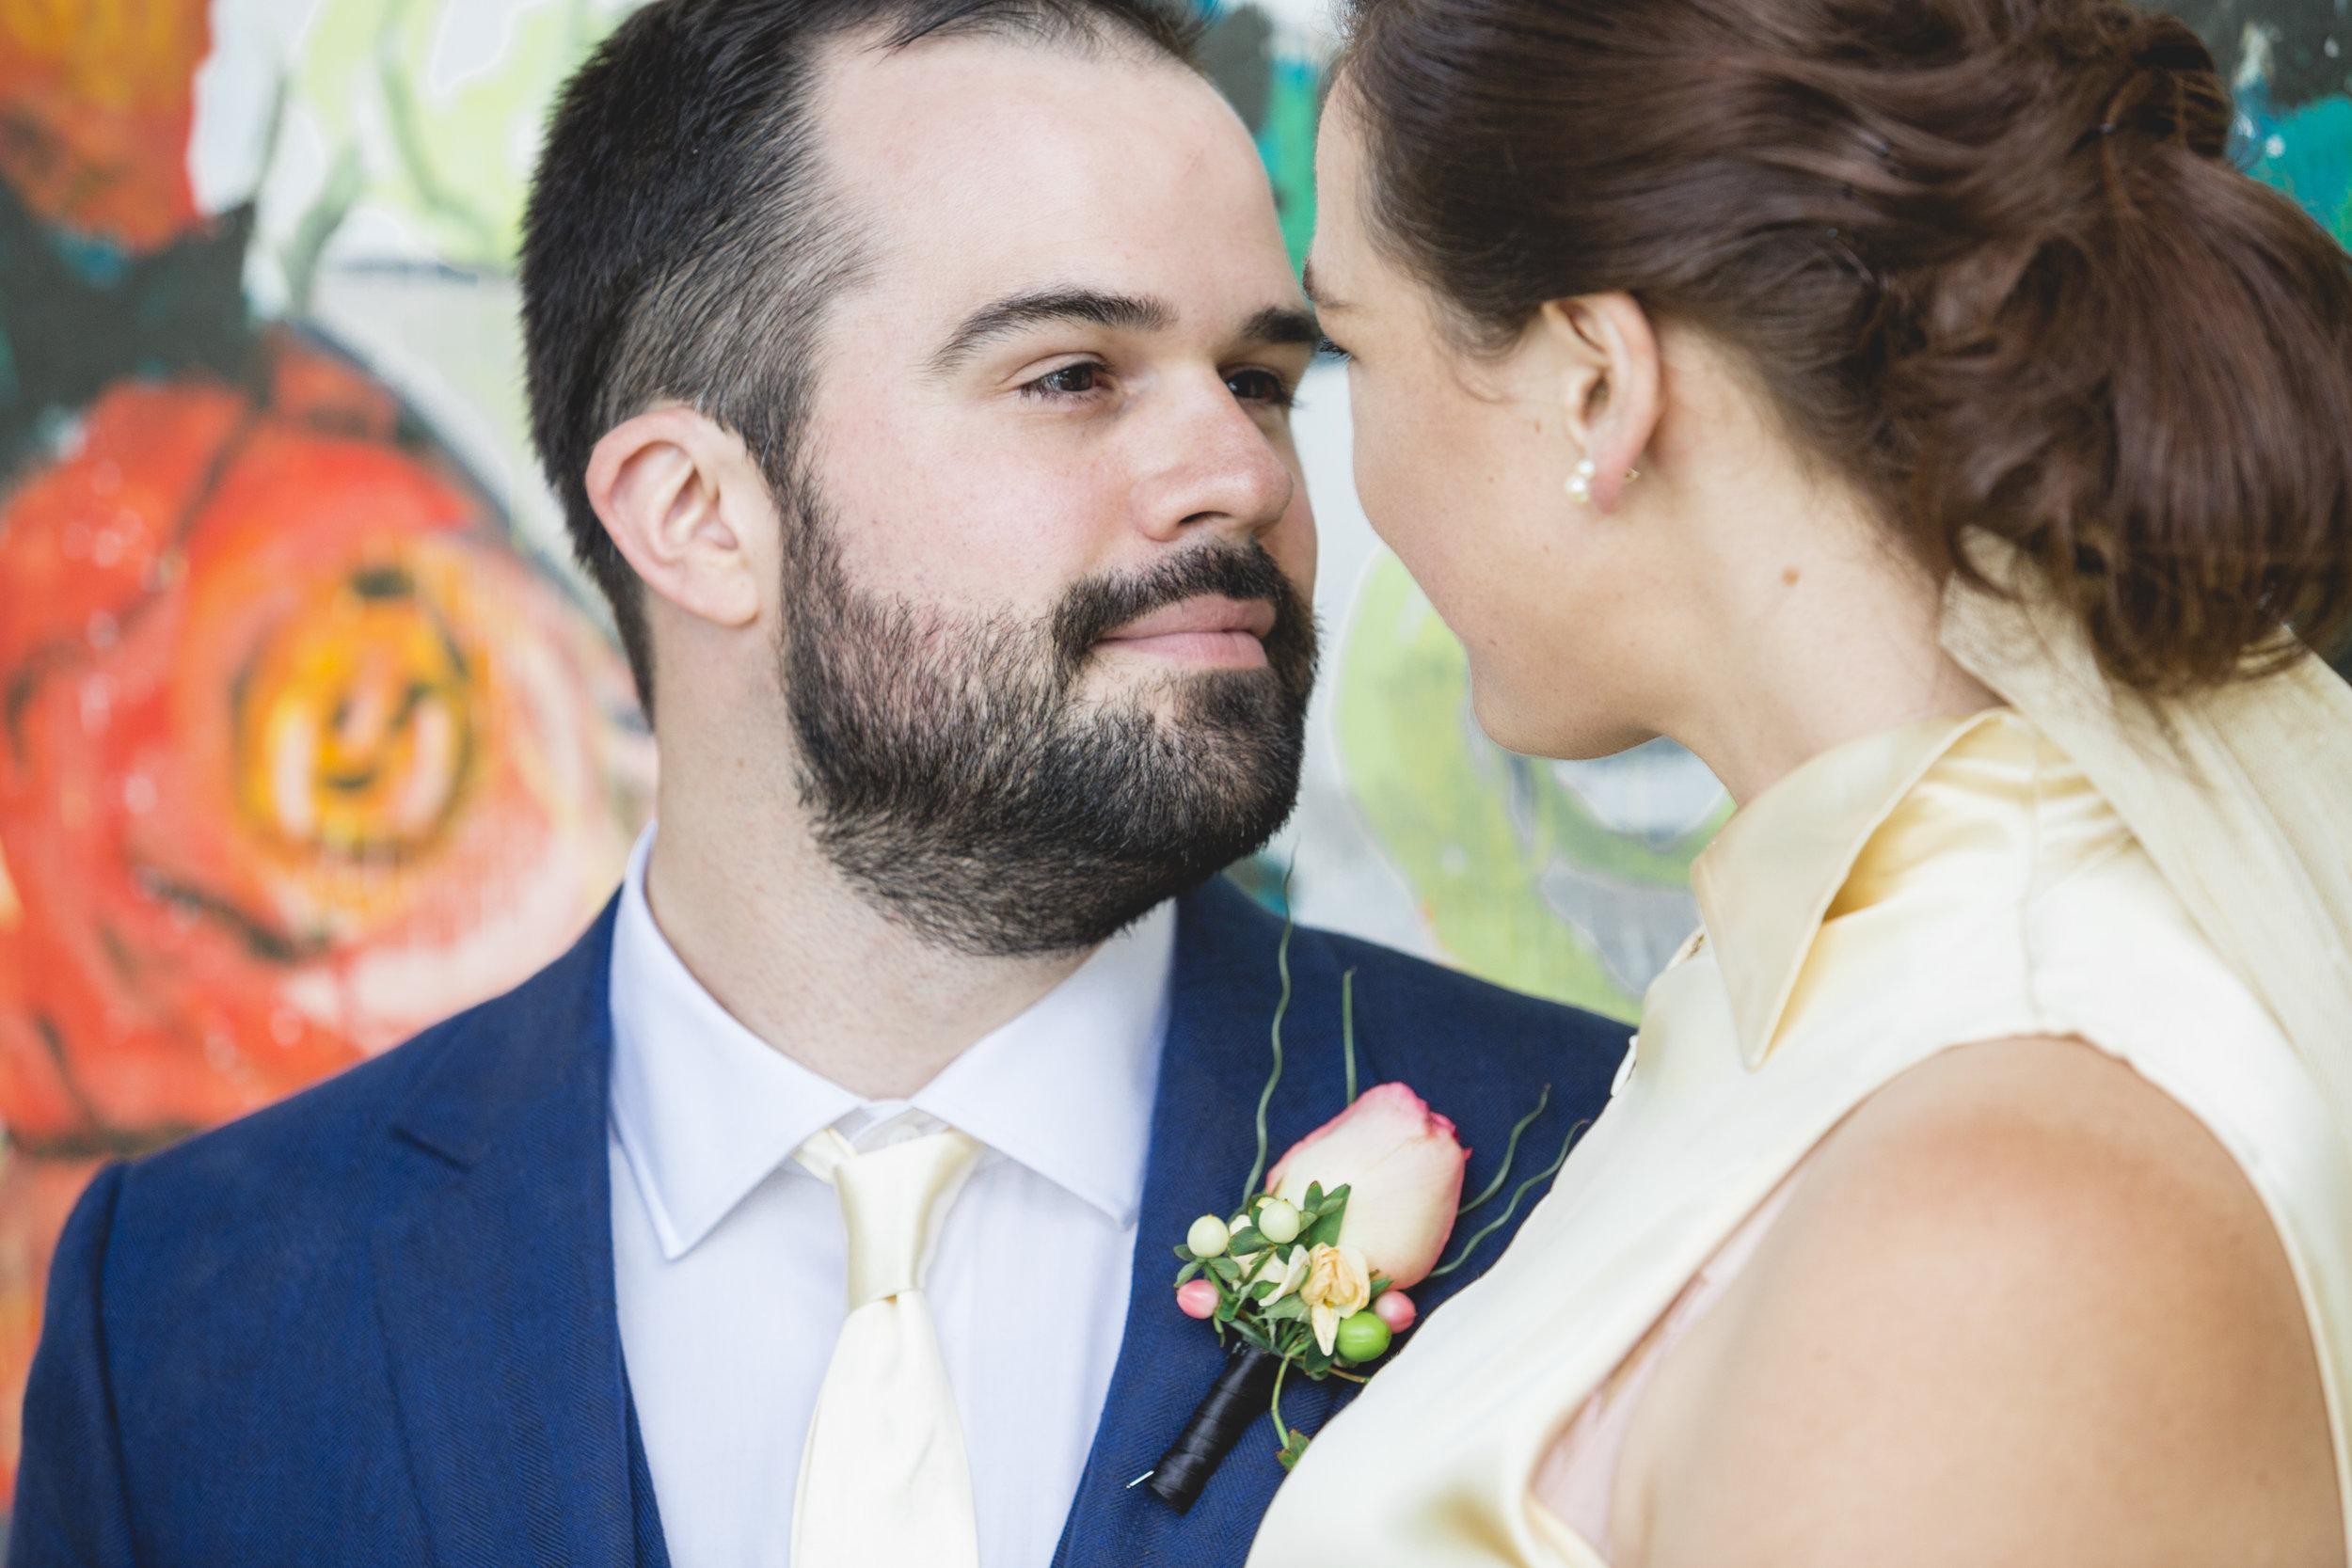 Wedding Photography at the Toronto Argonaut Rowing Club